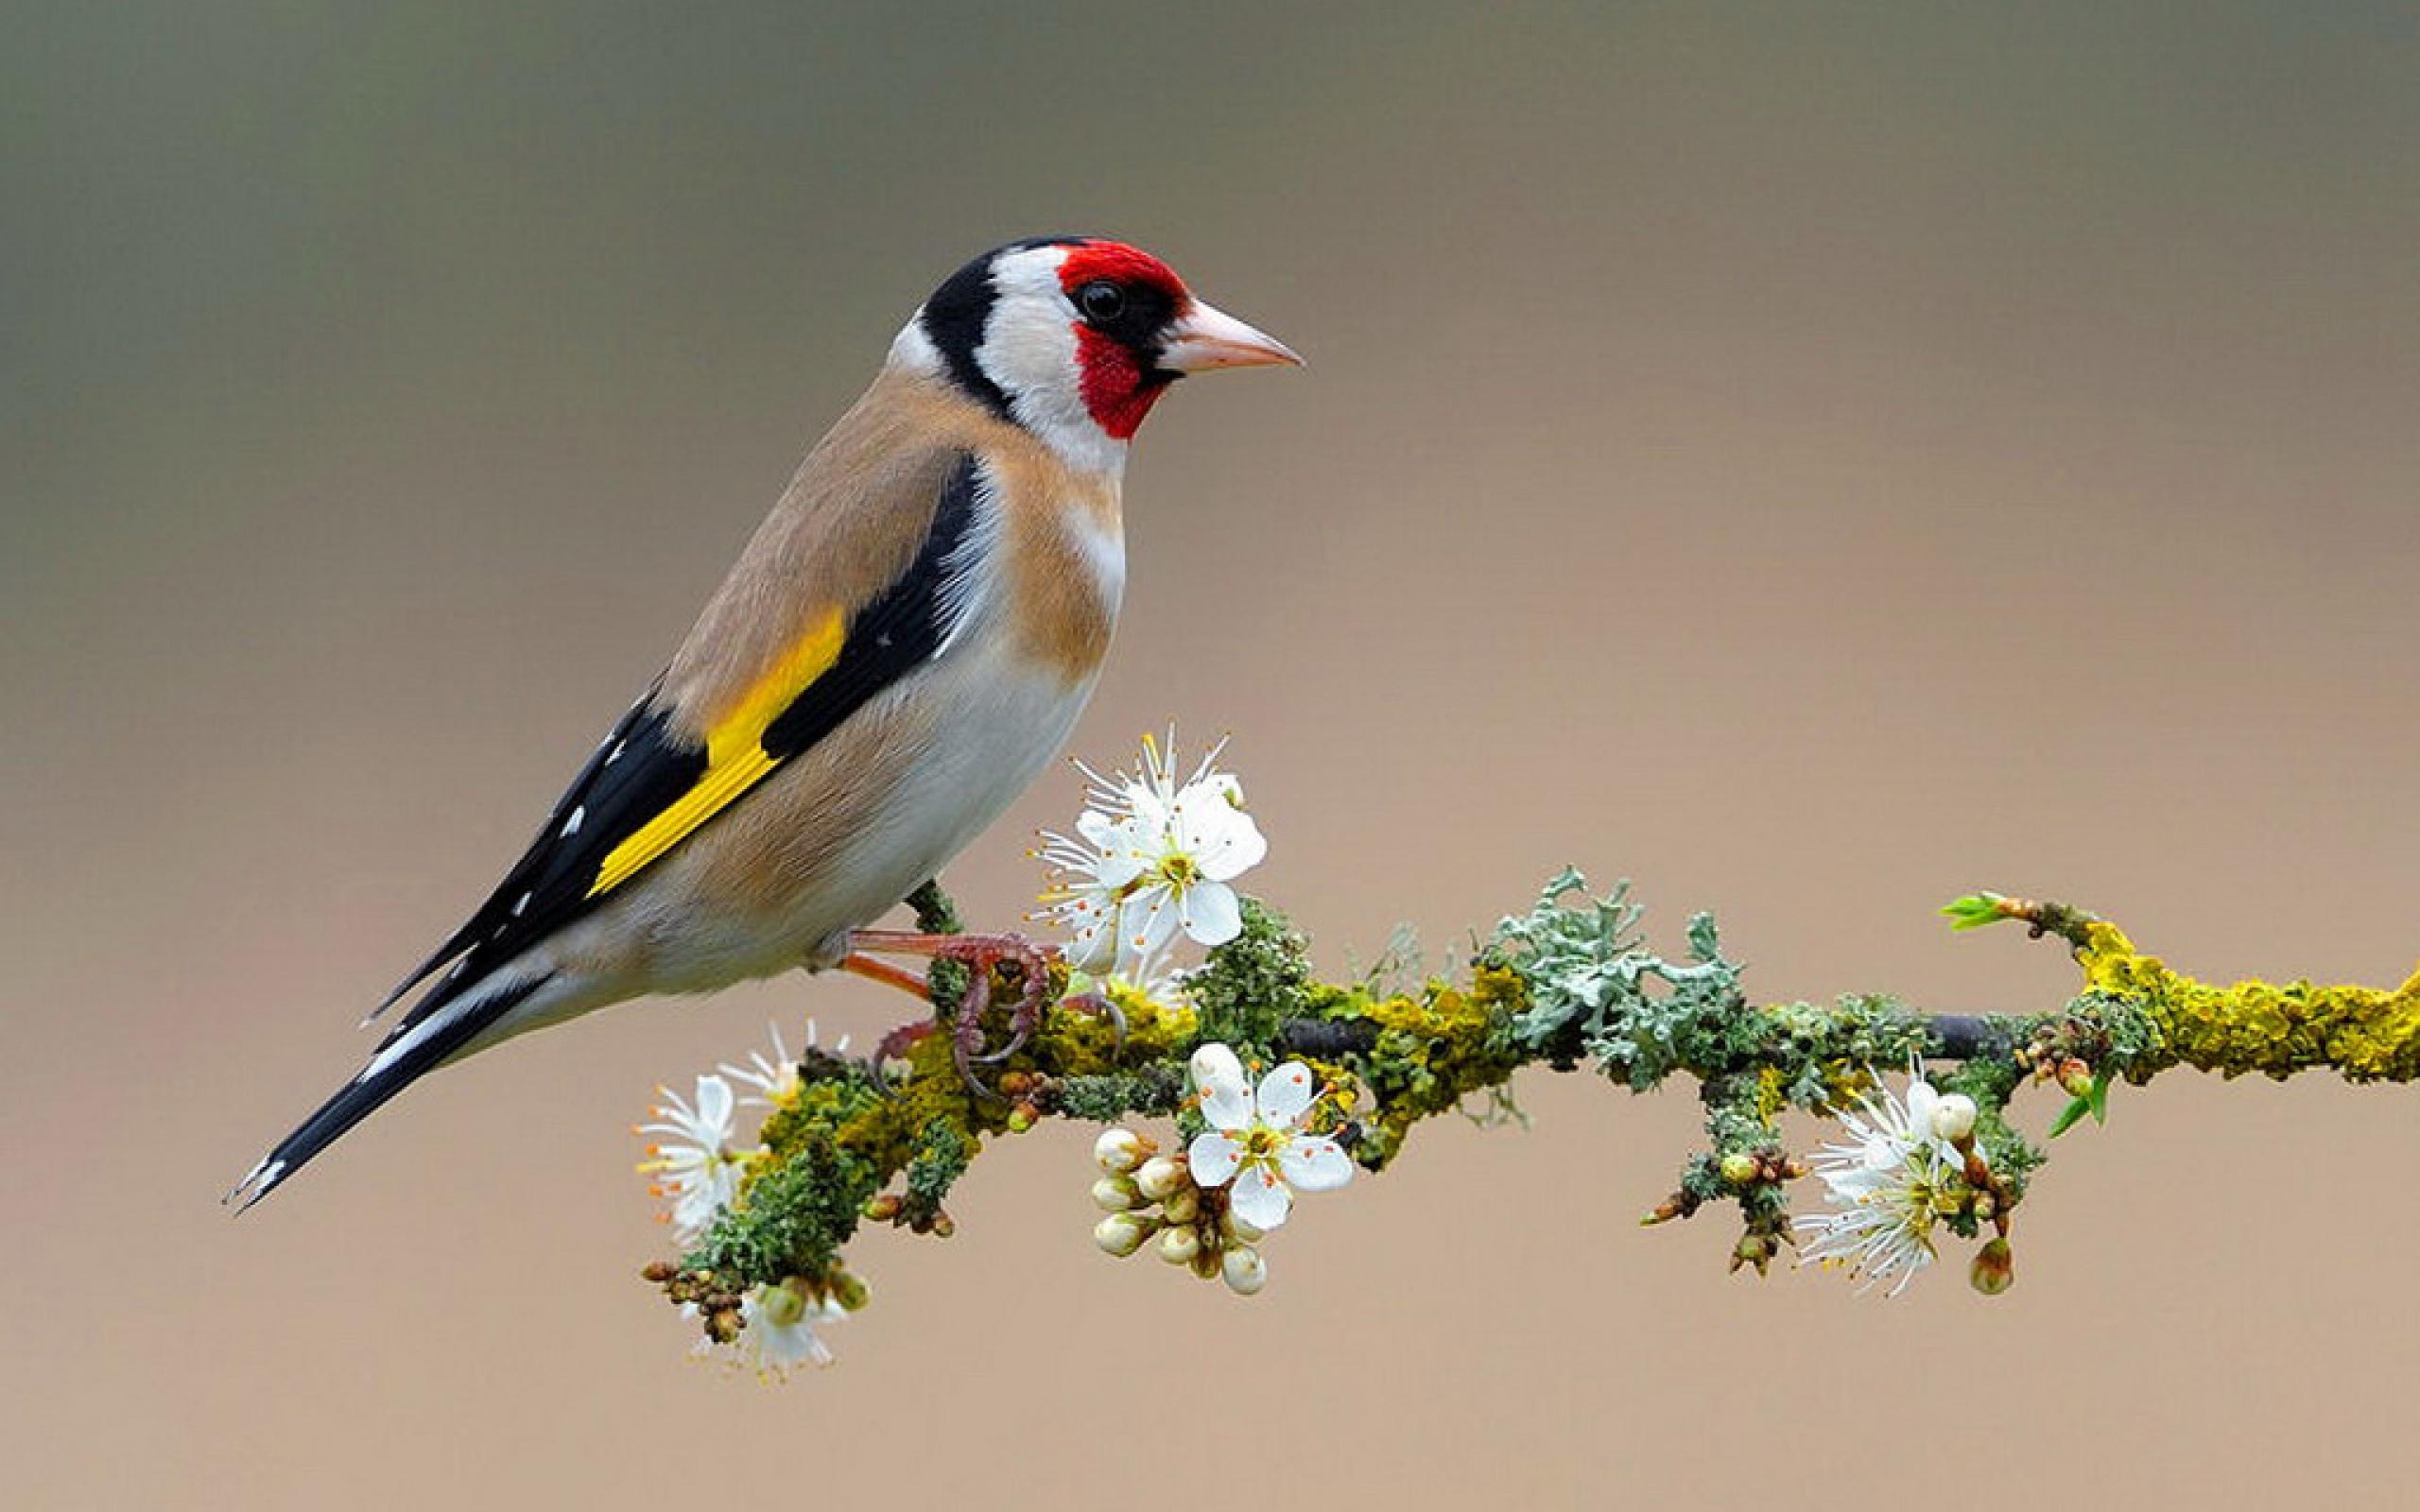 Wallpaper With Birds Flowers And Birds Wallpaper  Wallpapersafari